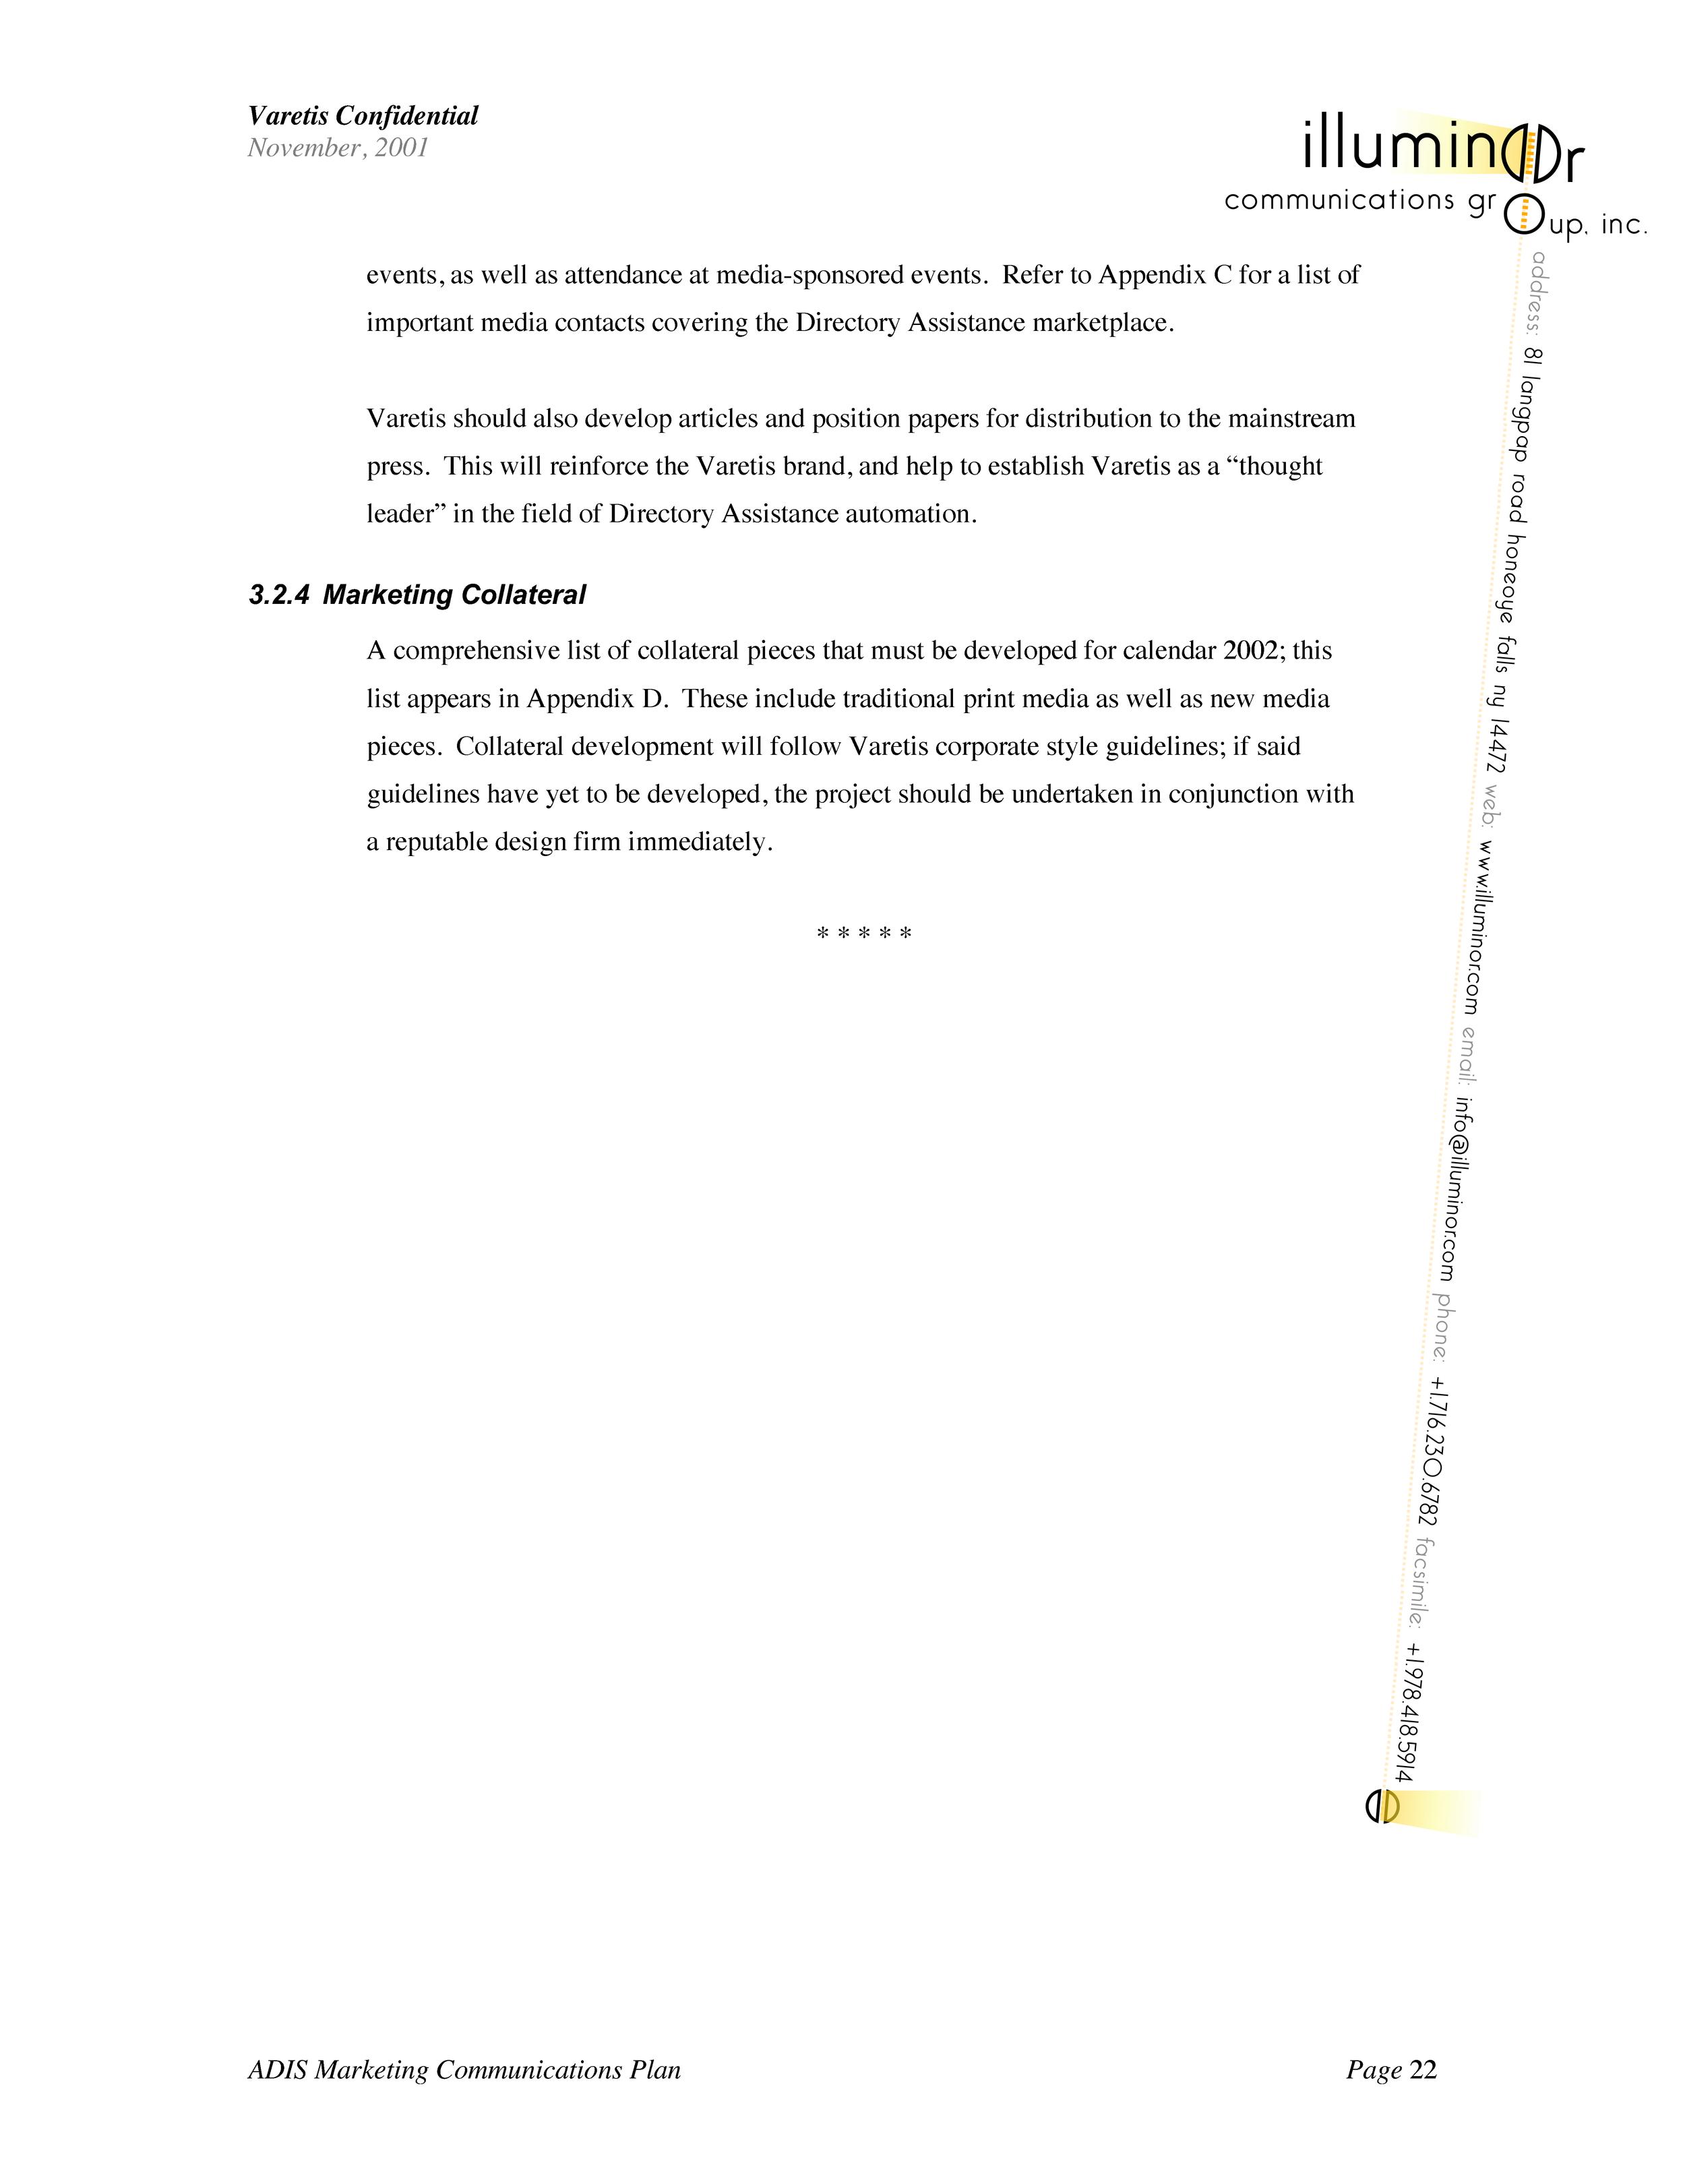 ADIS Marcomm Plan_Page_22.png